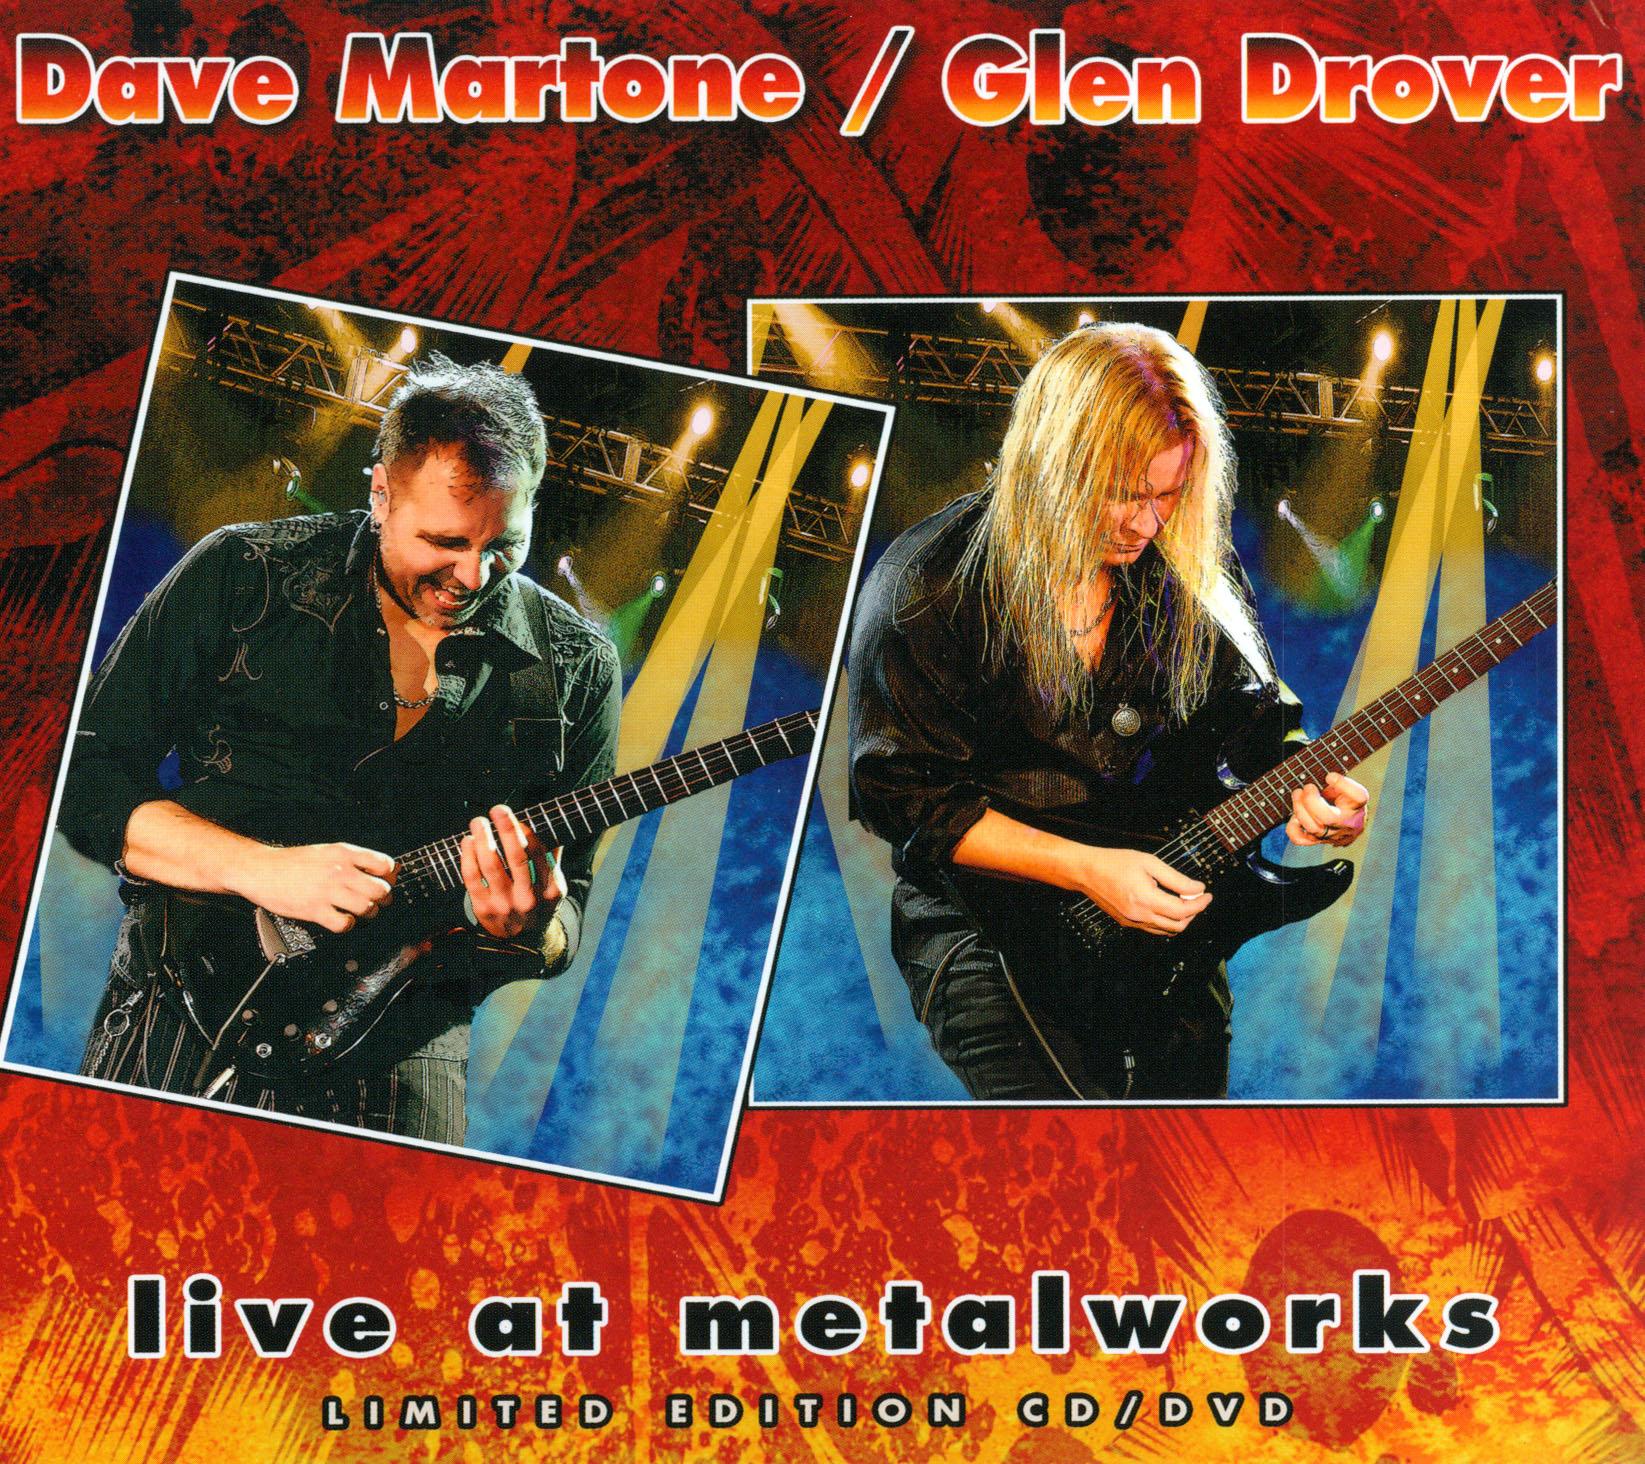 Dave Martone/Glen Drover: Live at Metalworks